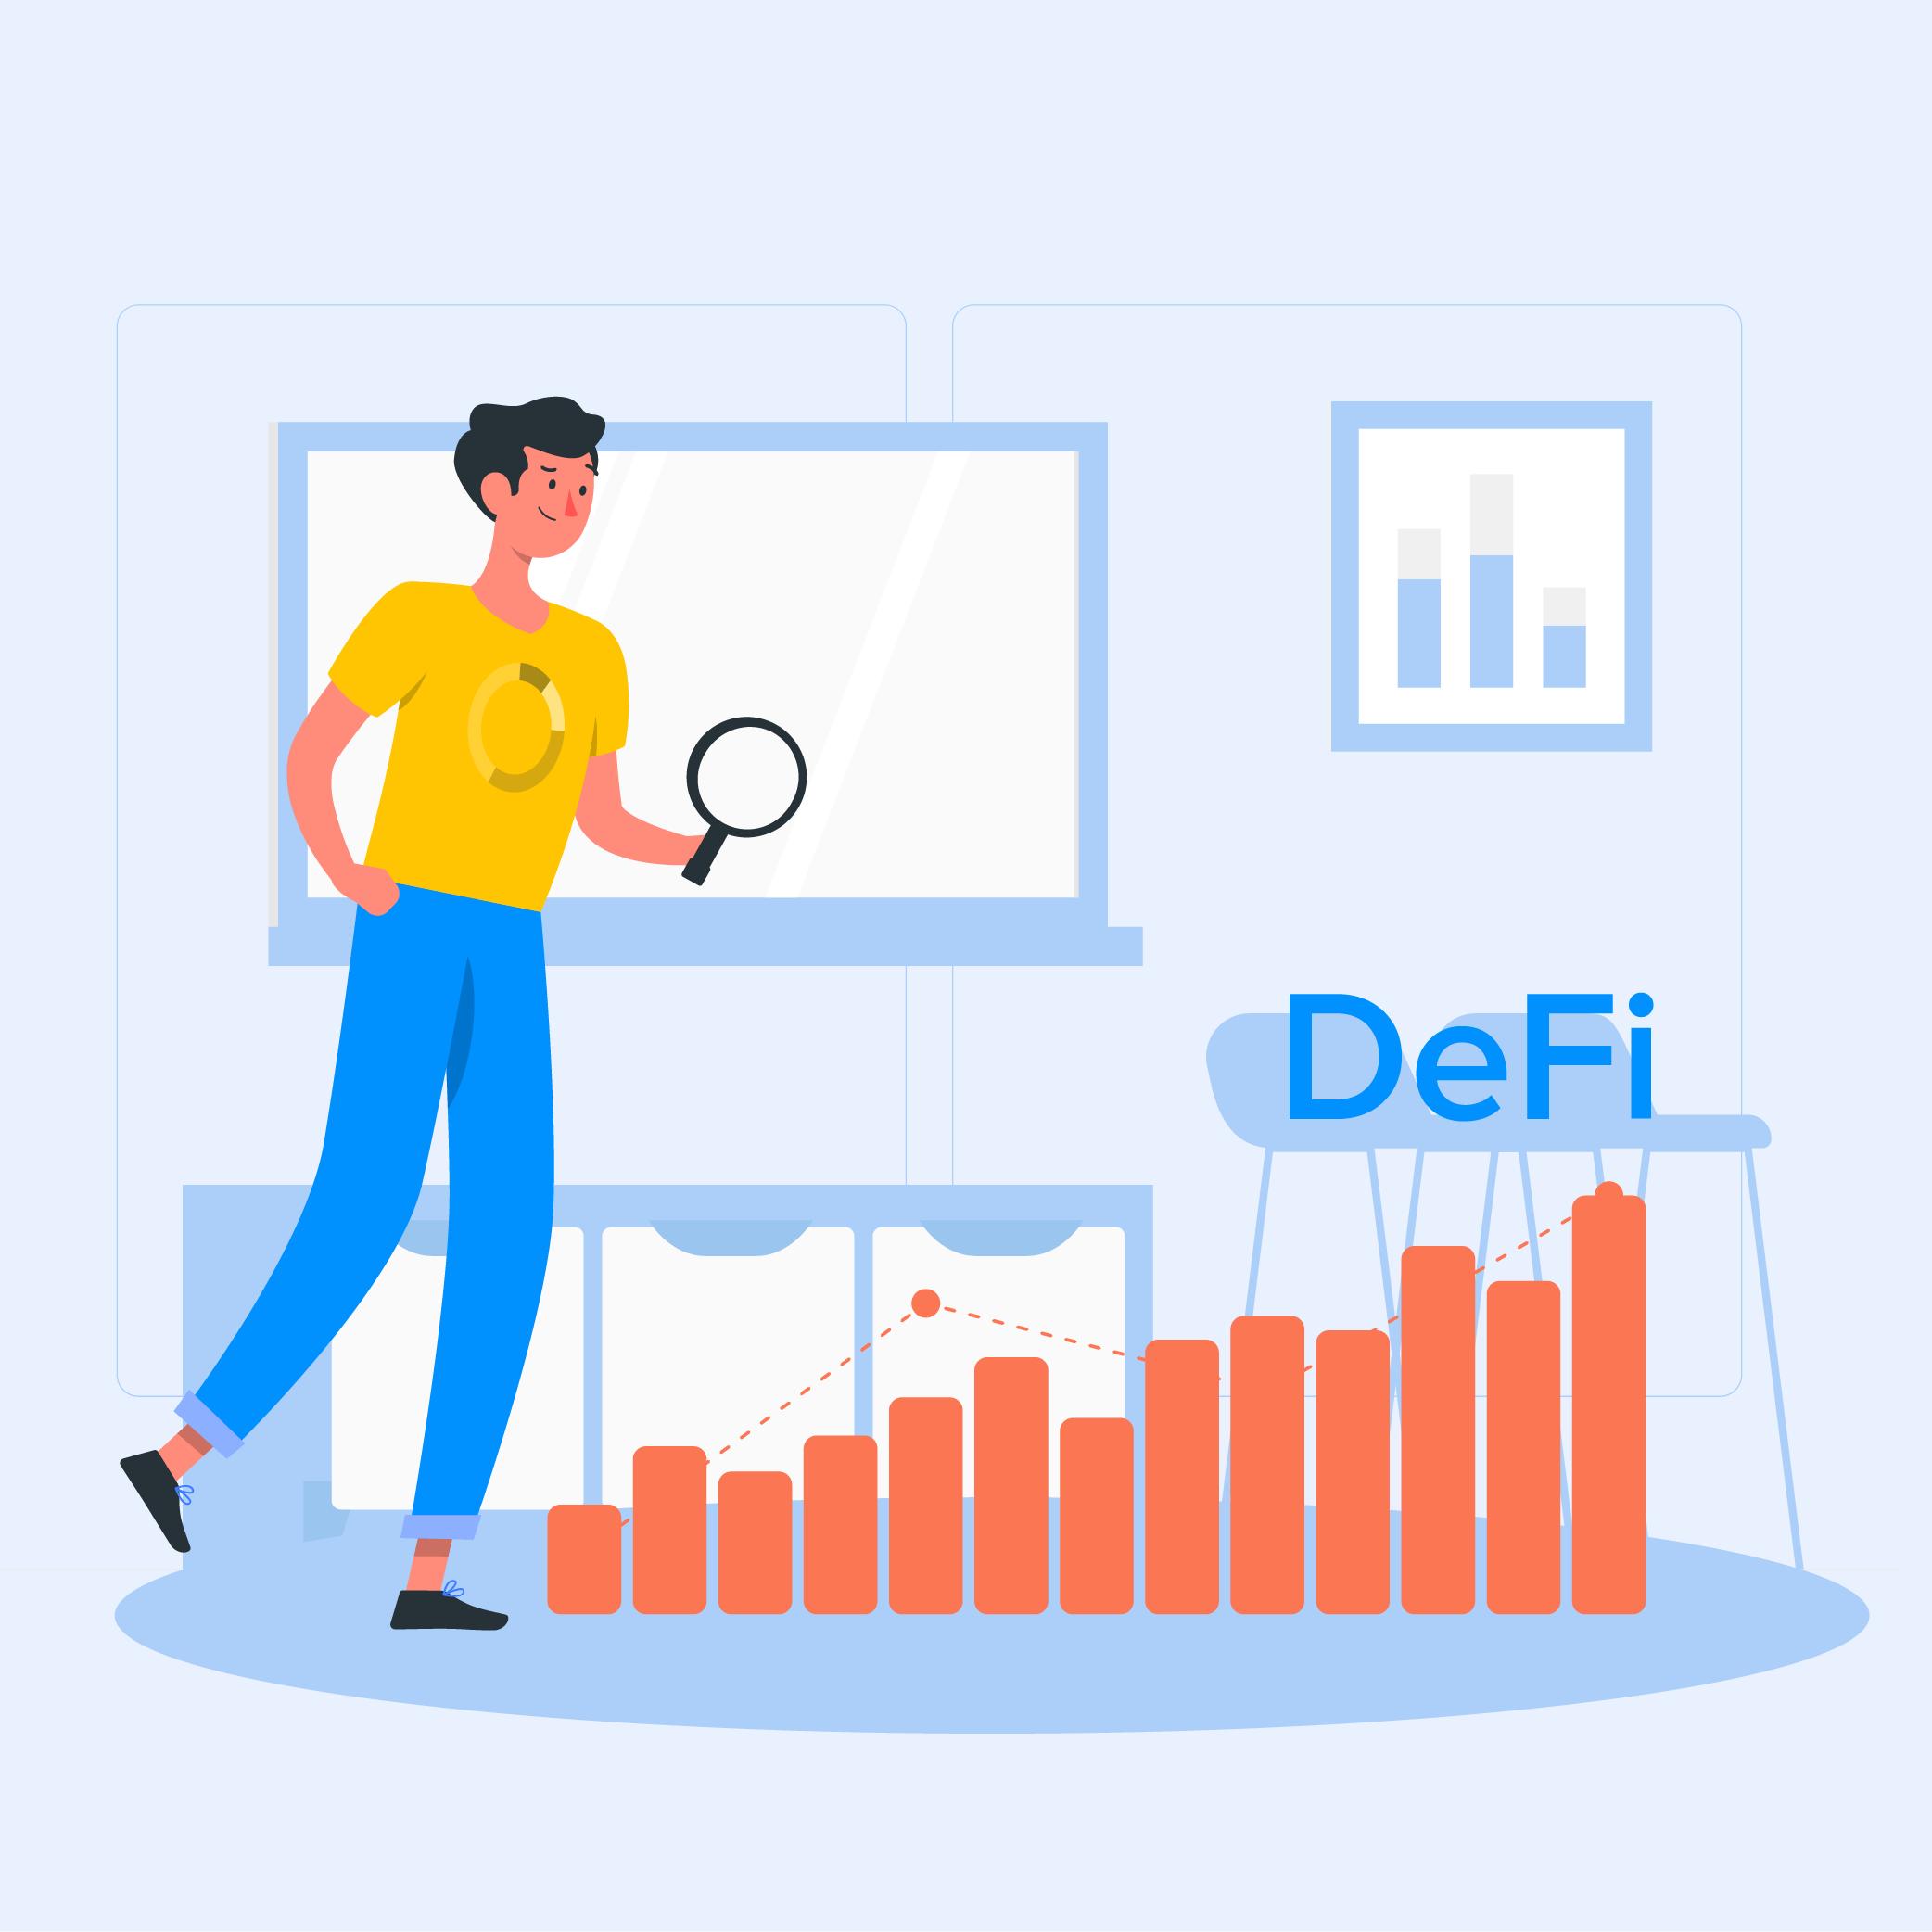 Latest DeFi Trends In 2021